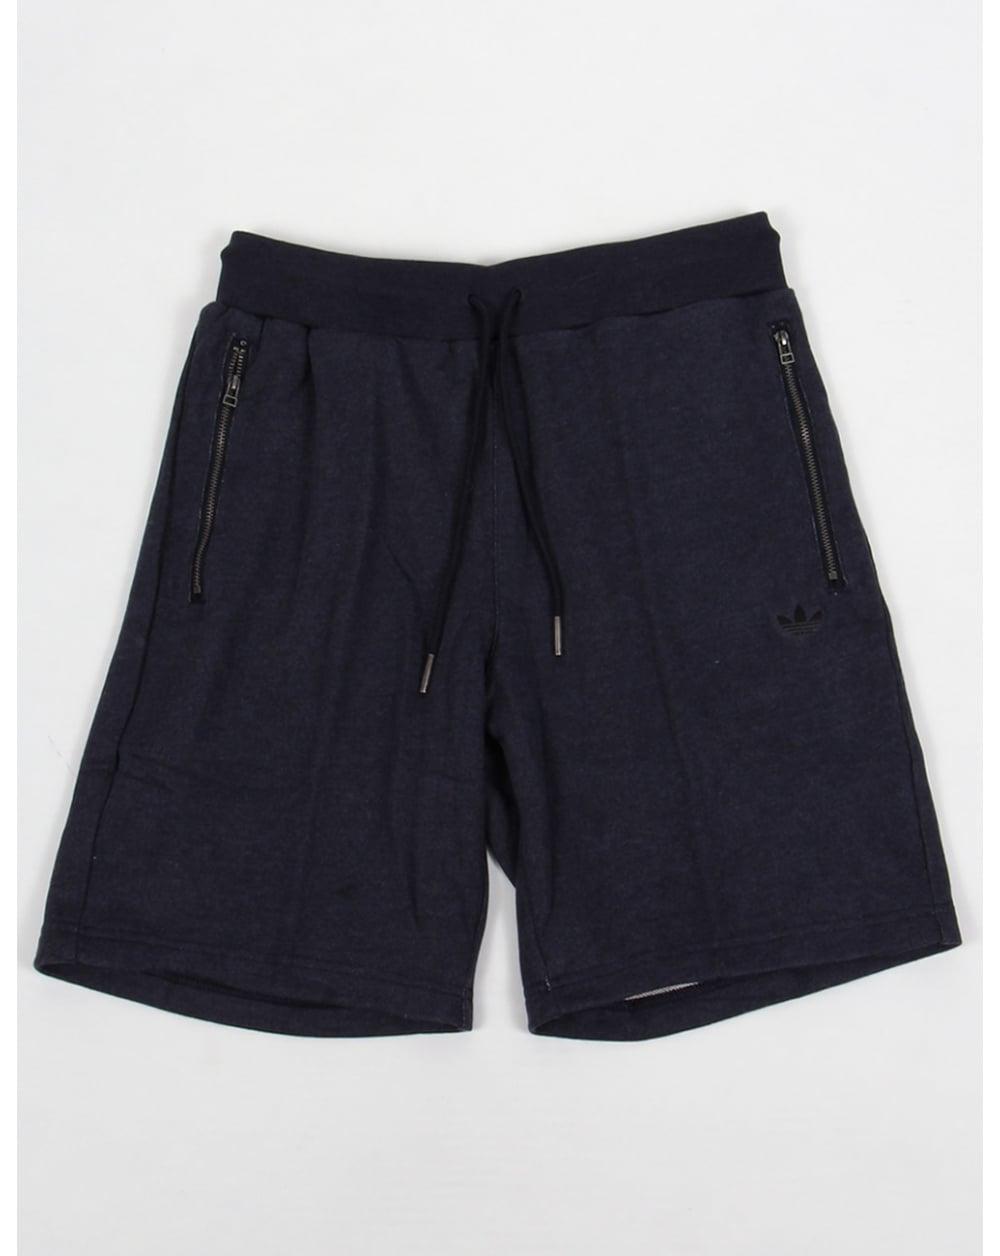 Crimsoune Club Khaki Shorts - Buy Crimsoune Club Khaki